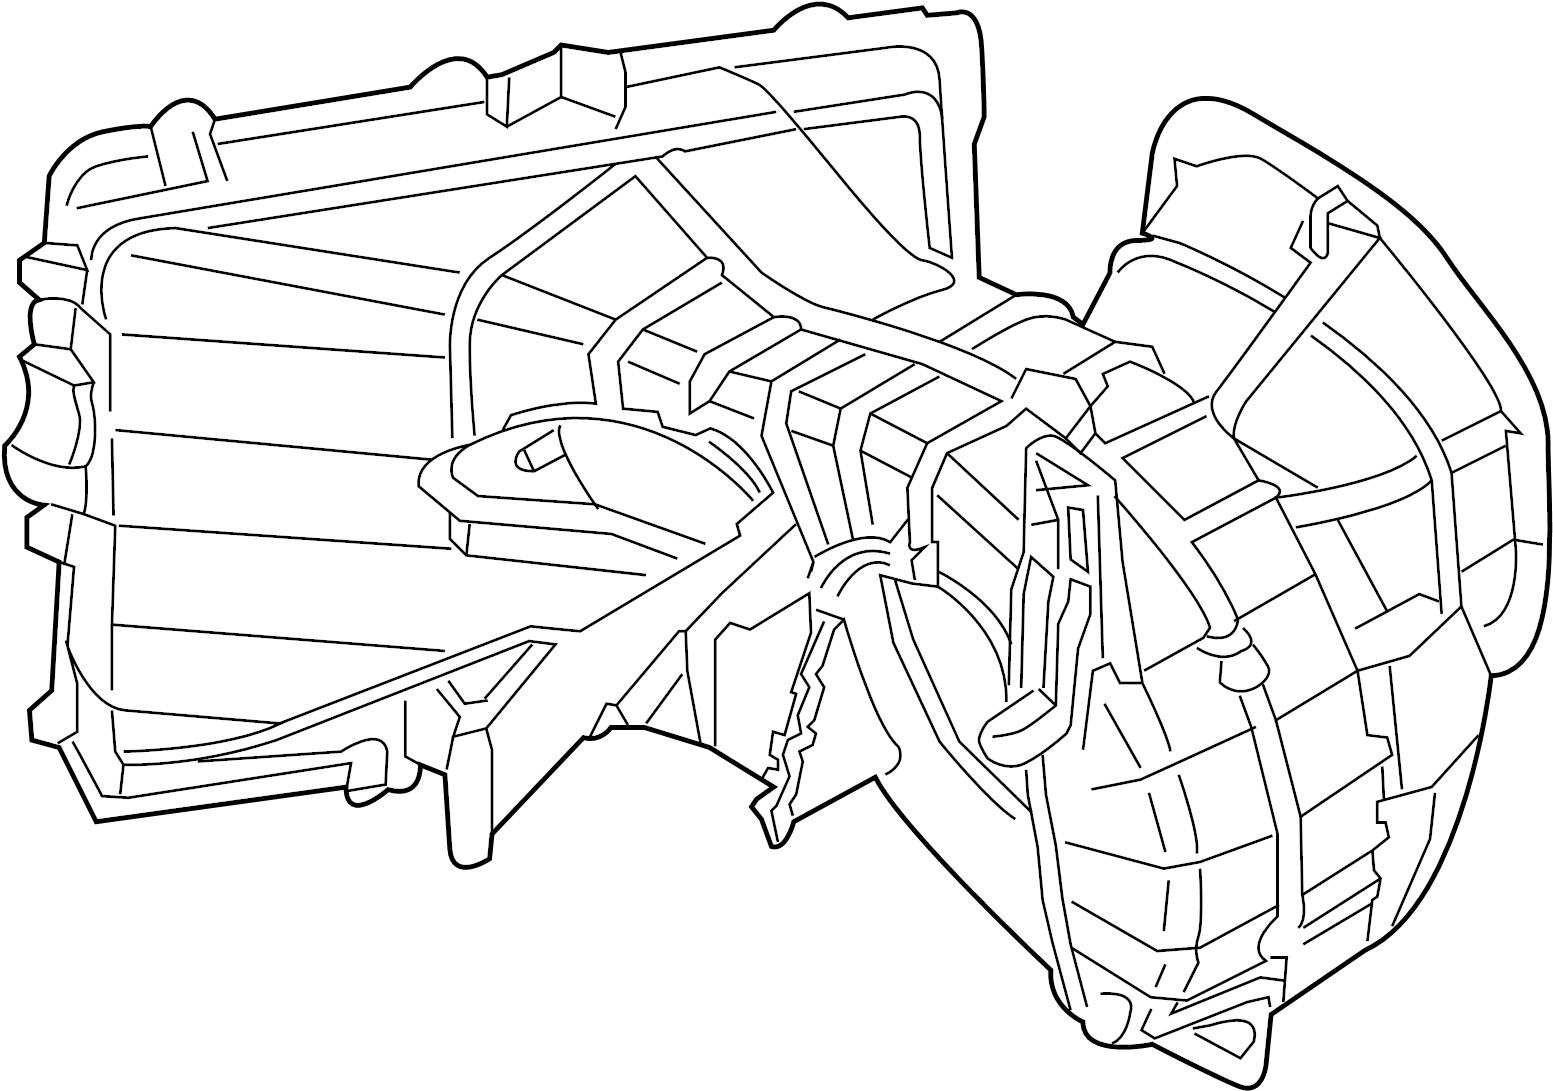 2013 Audi Q7 Hvac blower motor housing. Blower case. Hvac